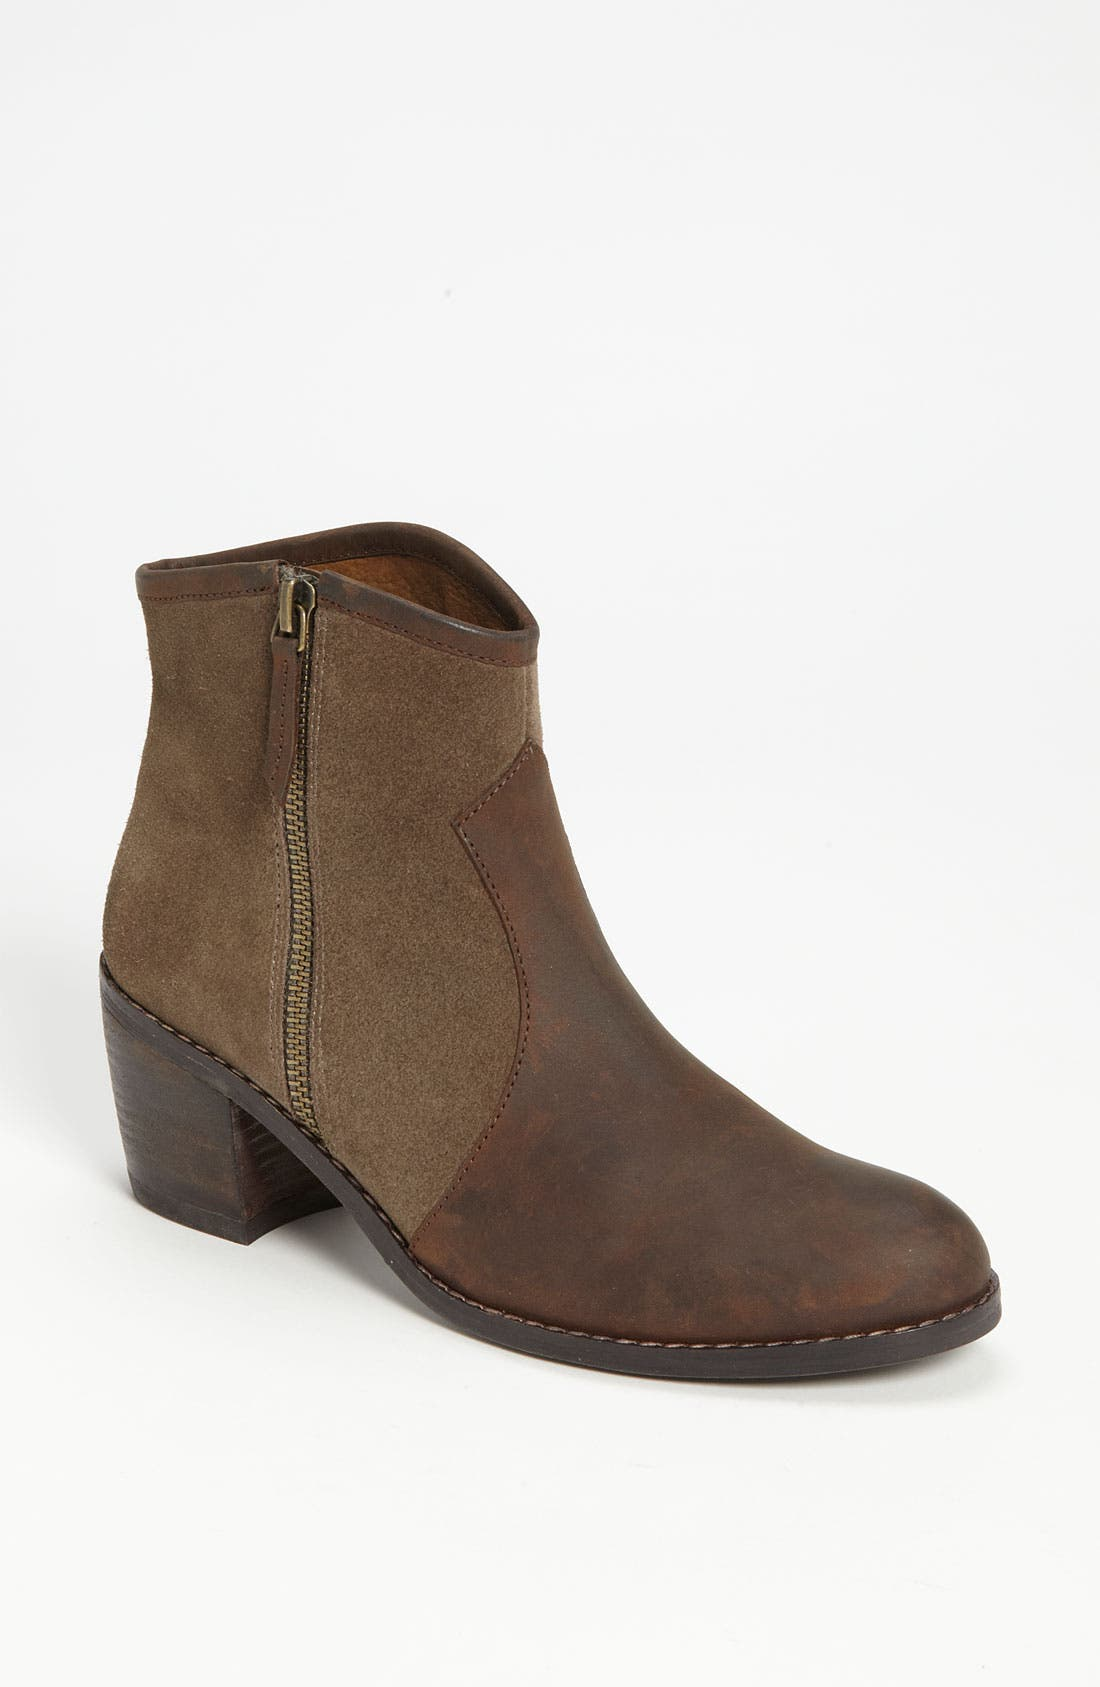 Alternate Image 1 Selected - Matisse 'Pricilla' Boot